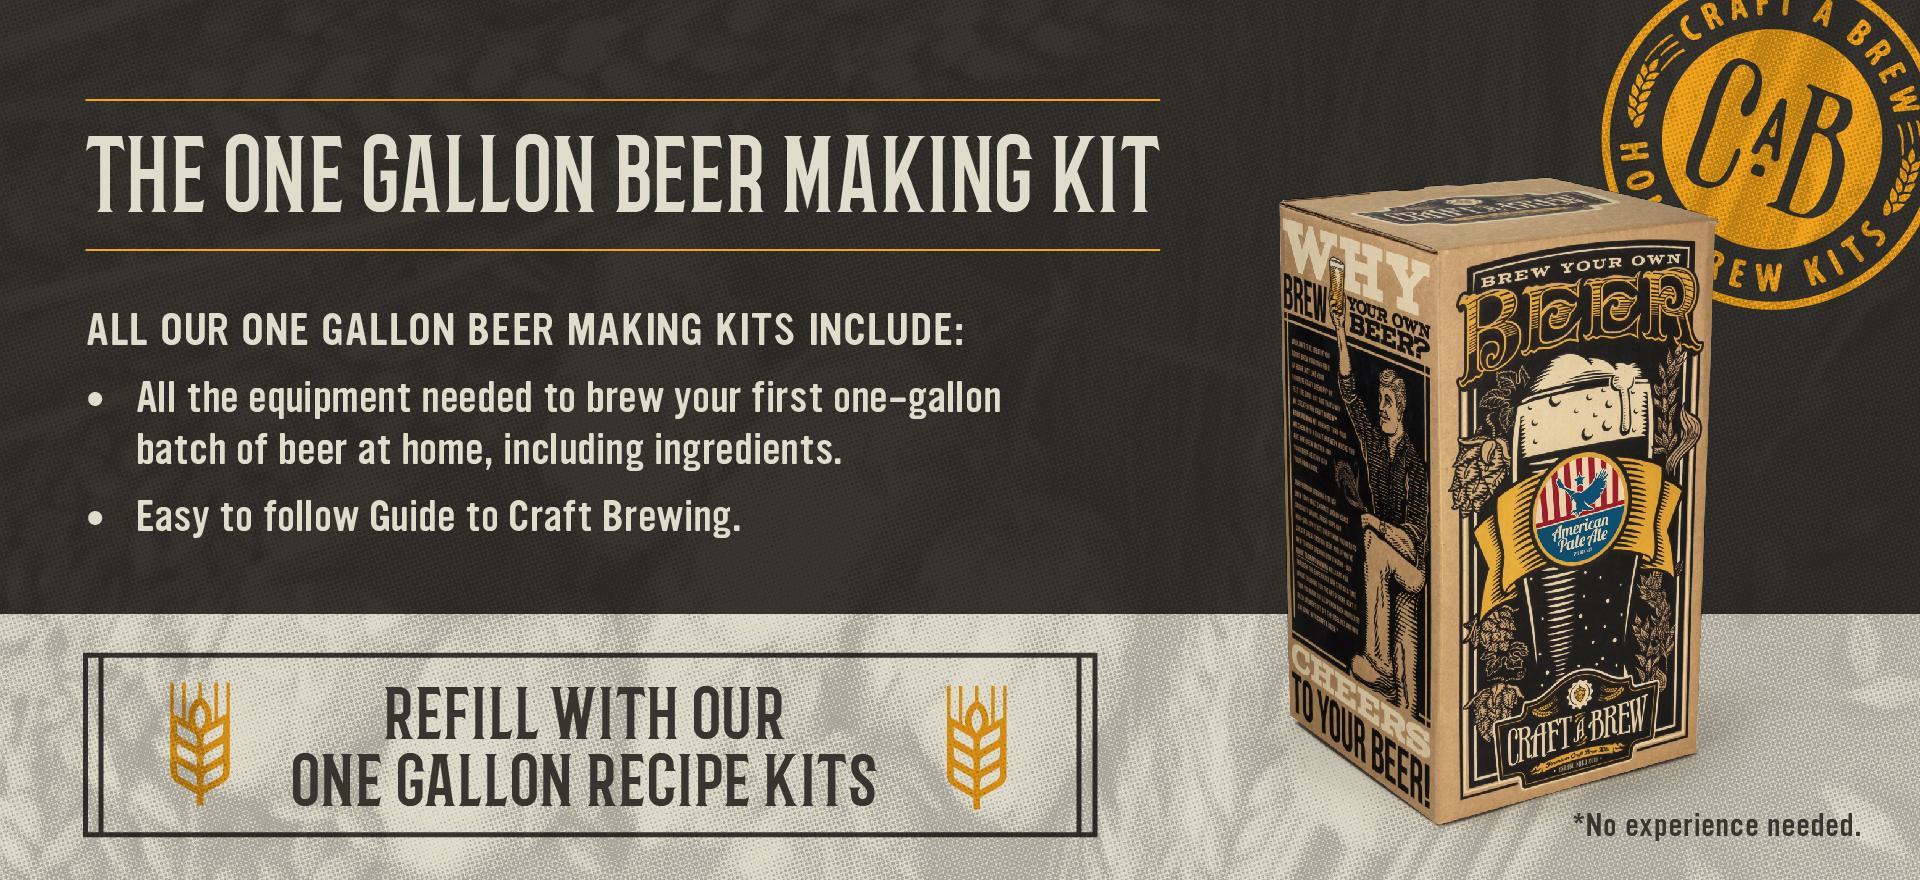 craft a brew brown ale beer brewing kit. Black Bedroom Furniture Sets. Home Design Ideas